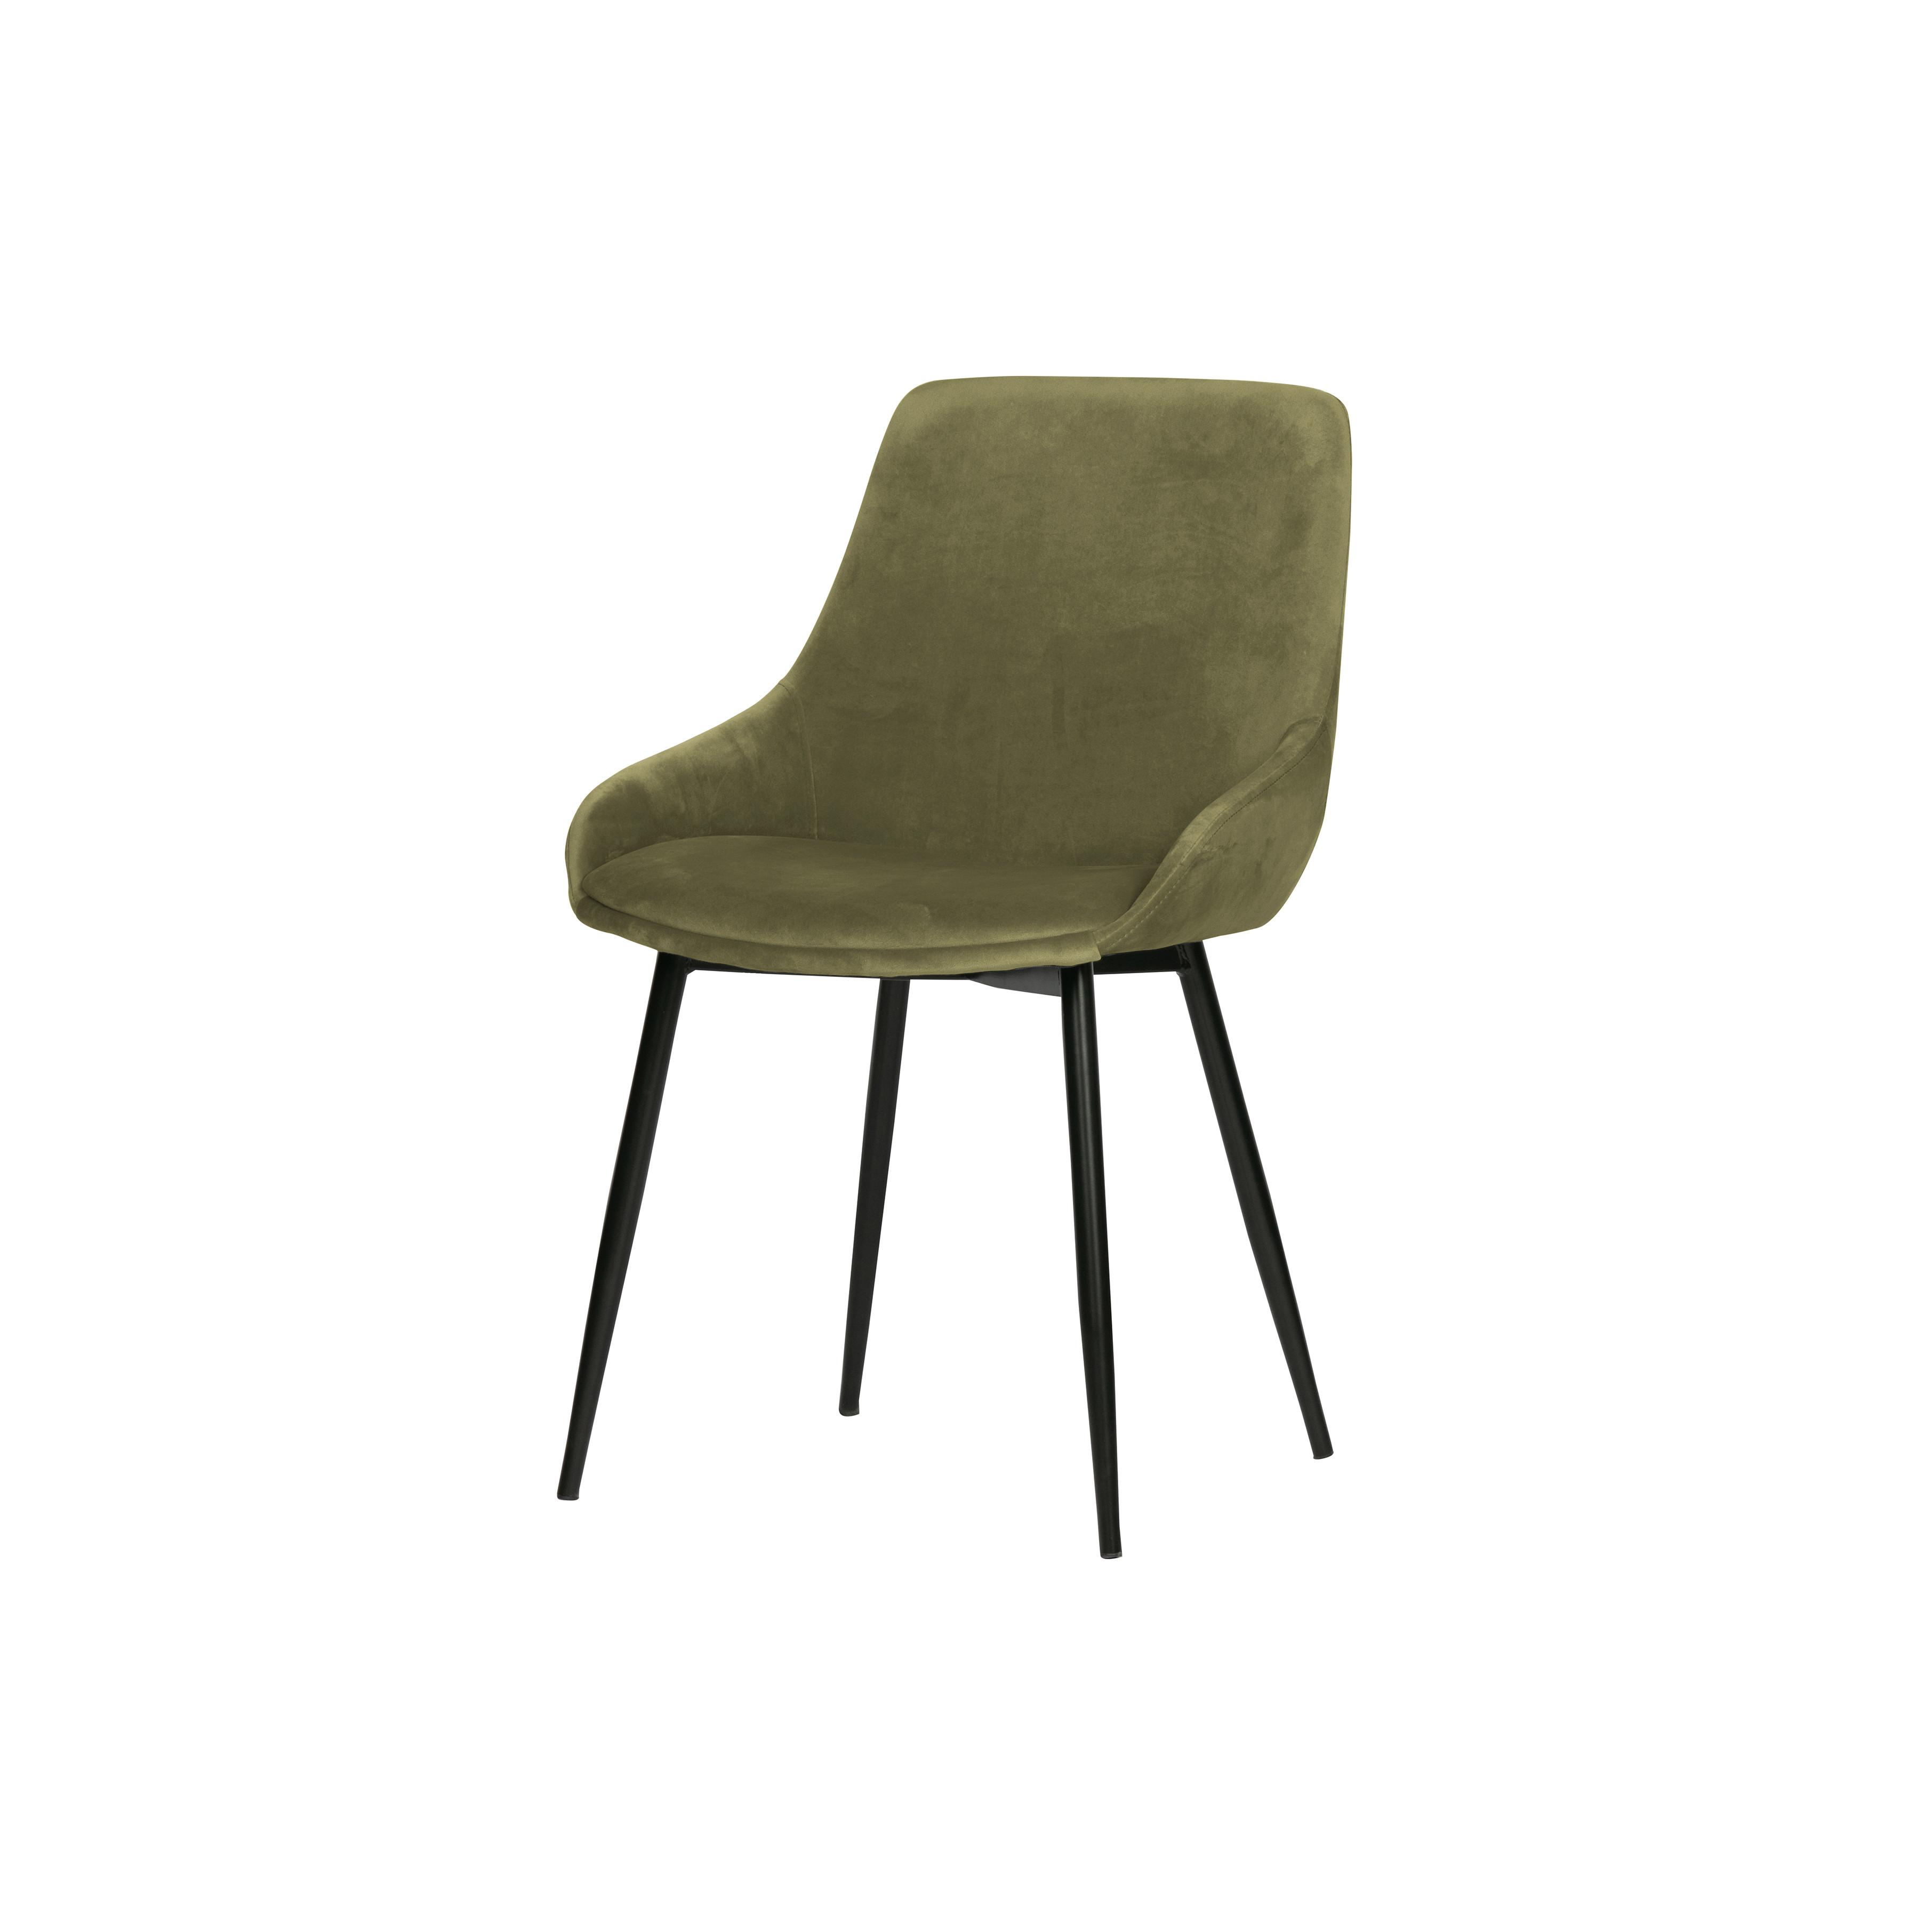 Dining Chair Selin | Grass Green